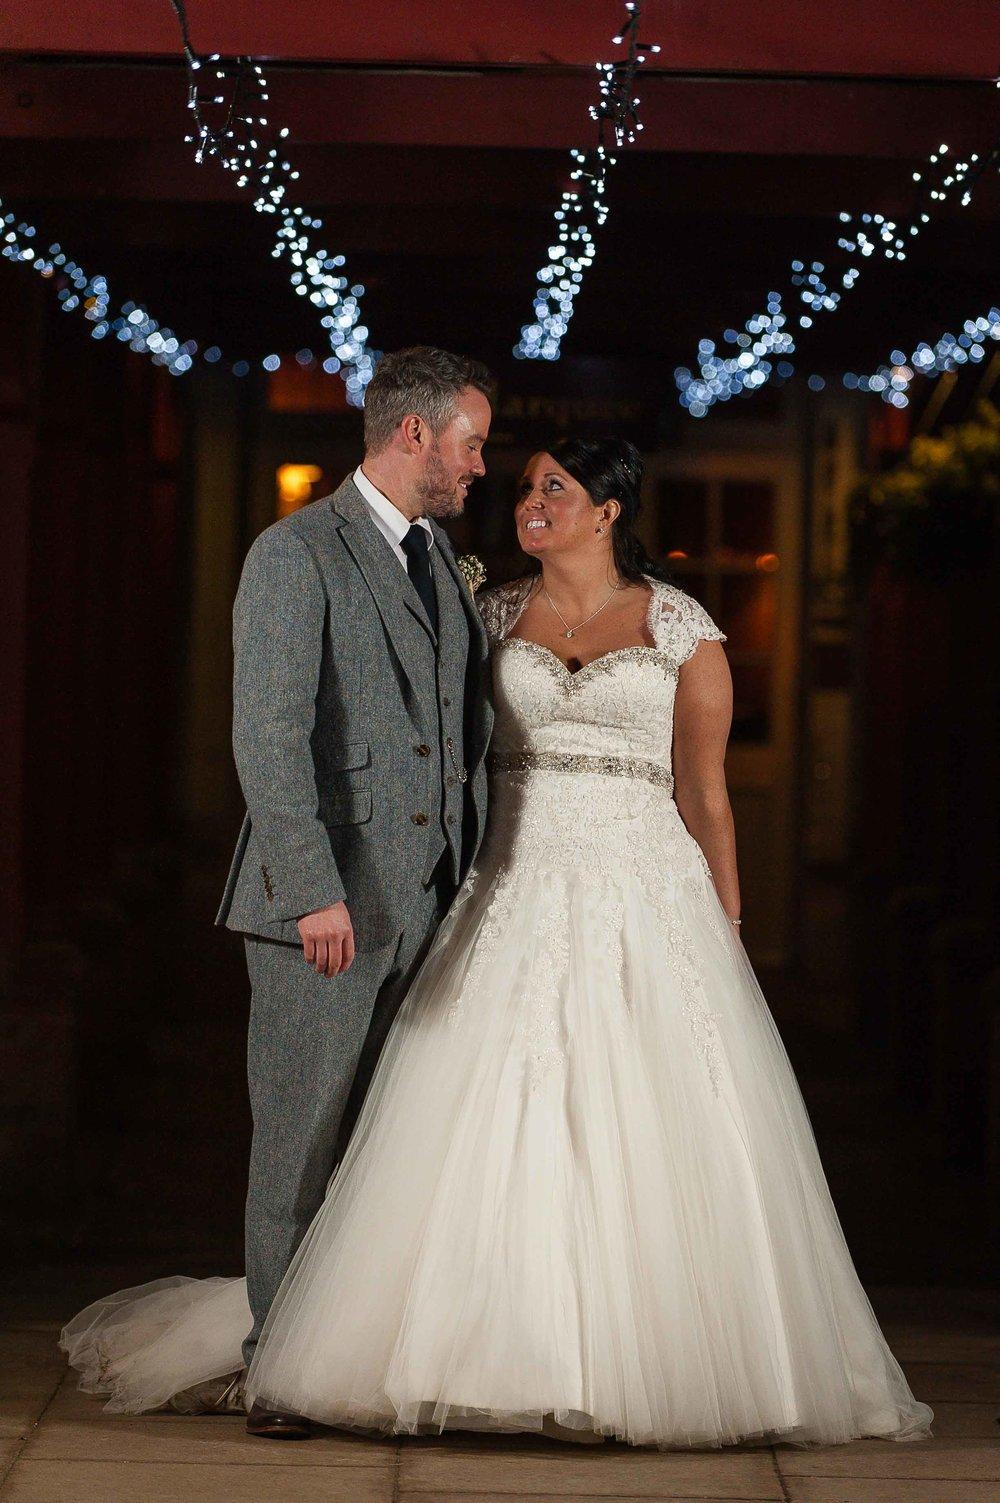 14.02.17 - Matt-Faye-Coombe-Abbey-Valentine-Wedding-Charnwood-Photography-1096.jpg